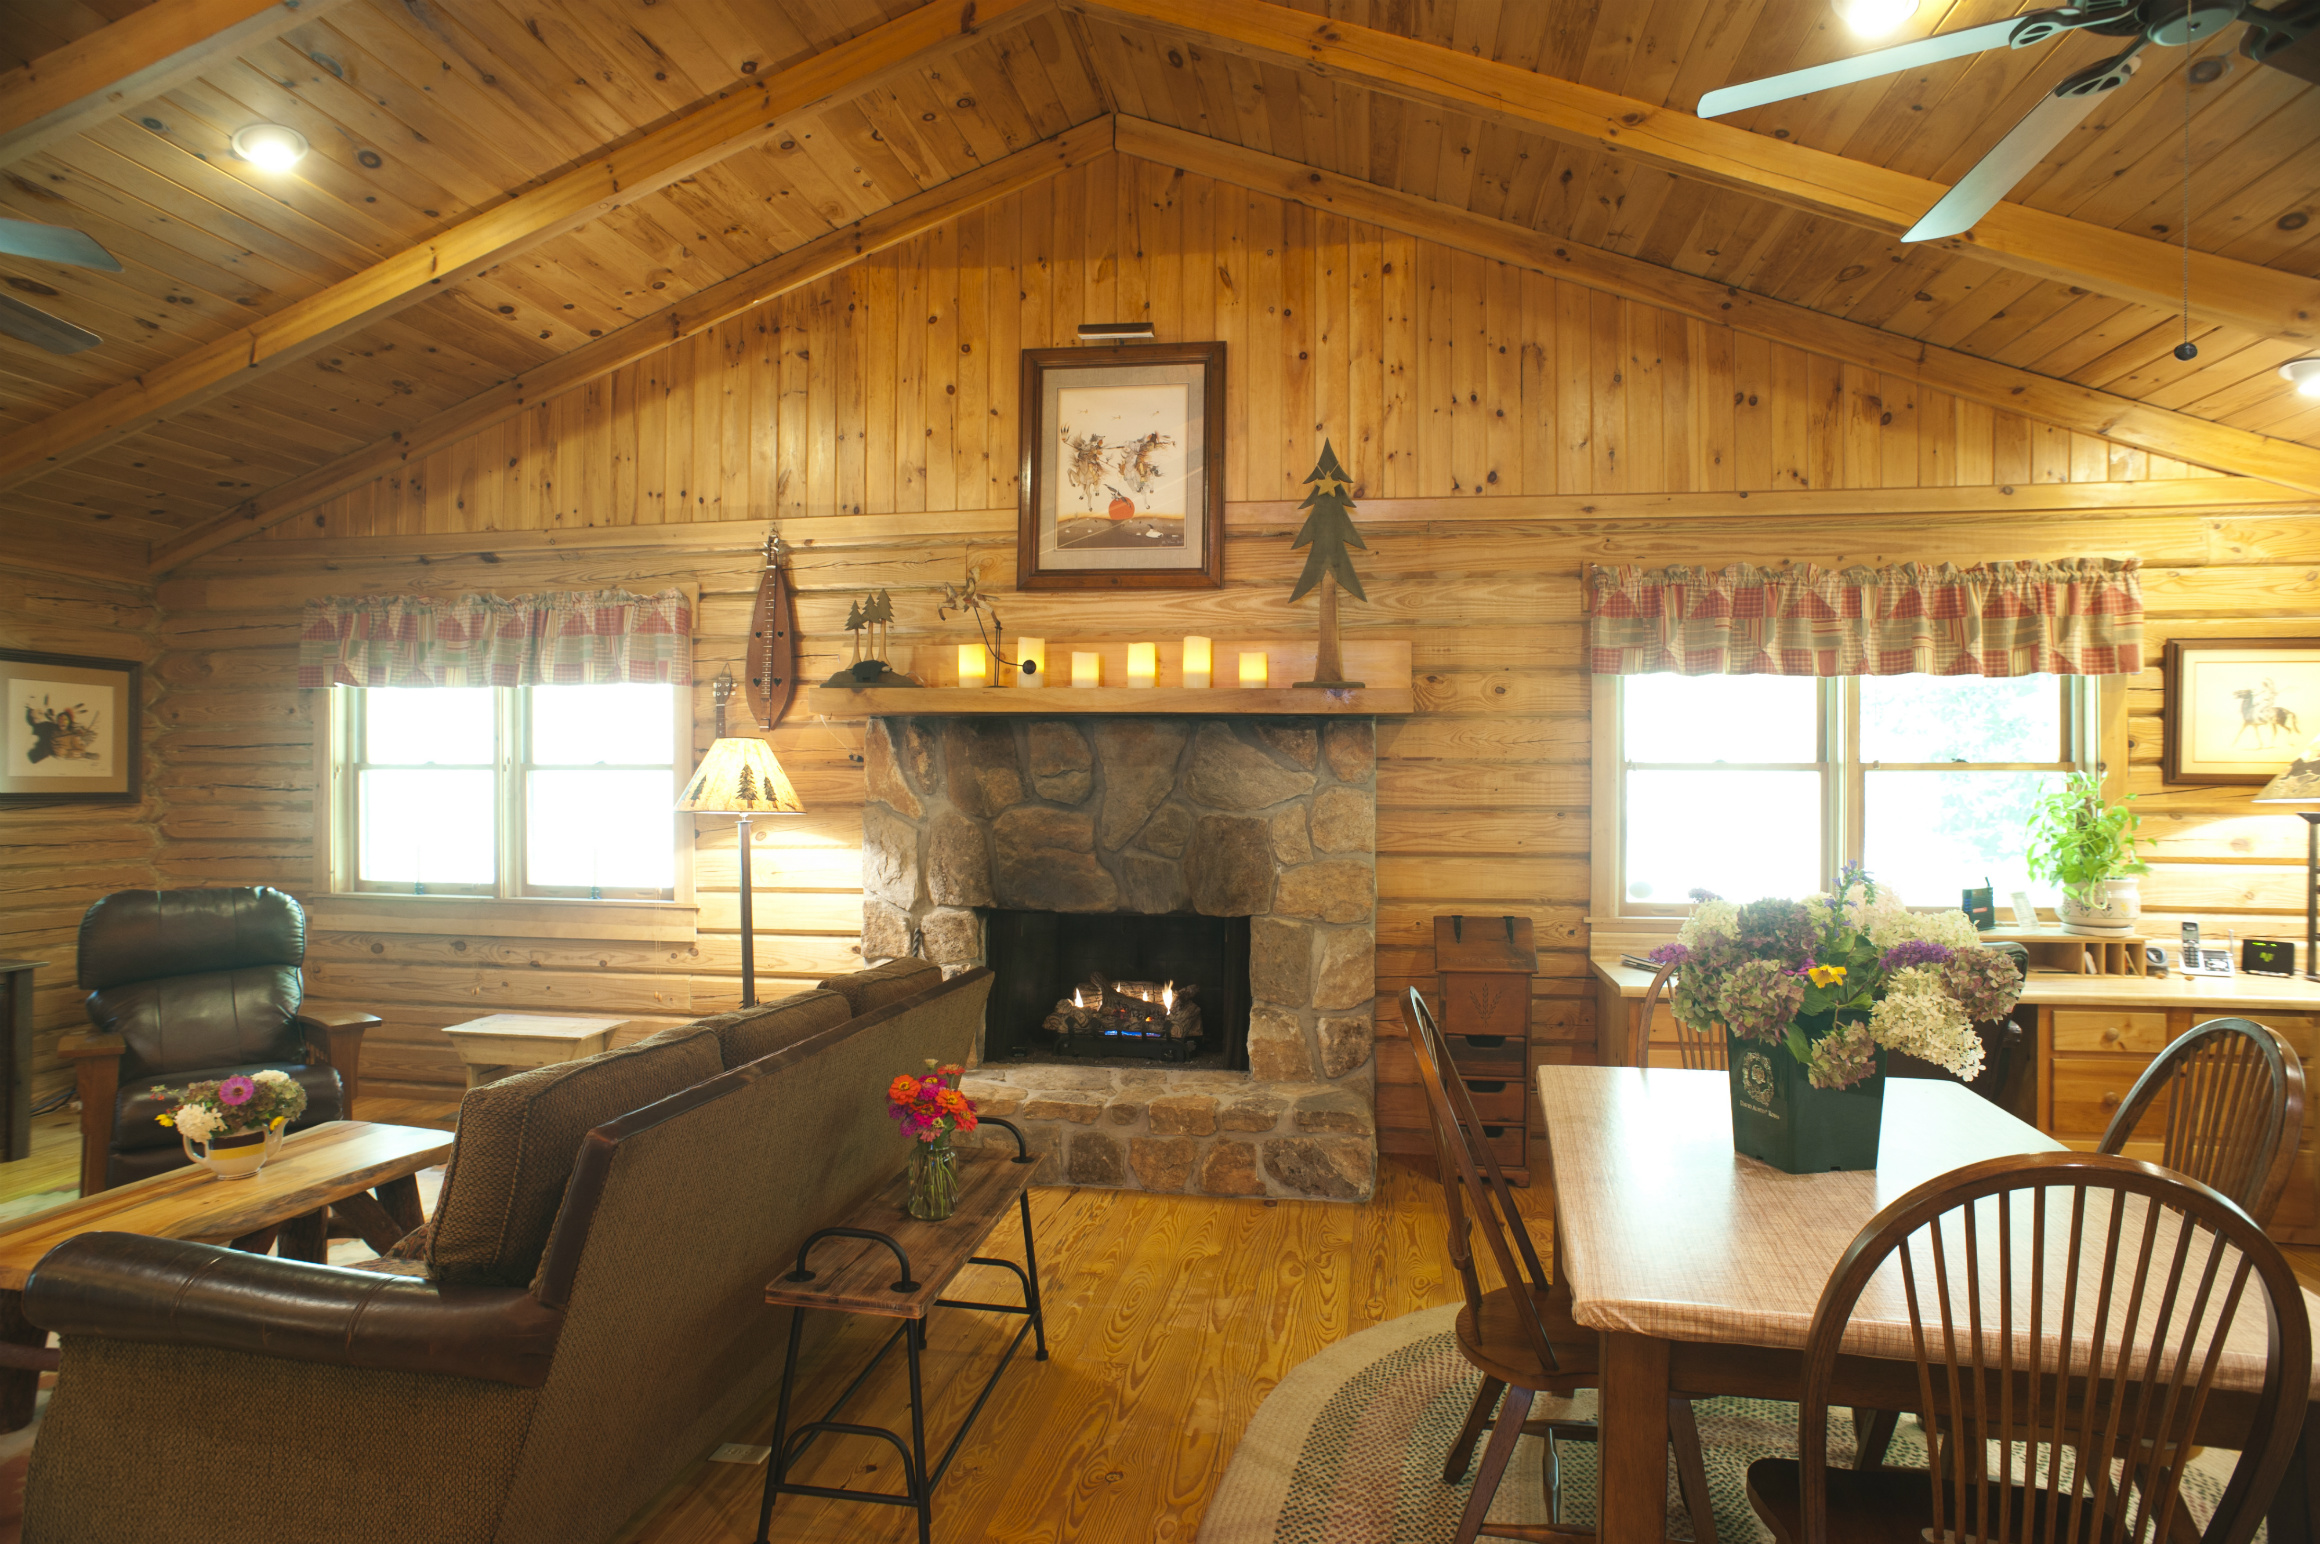 Bettys Creek cabin